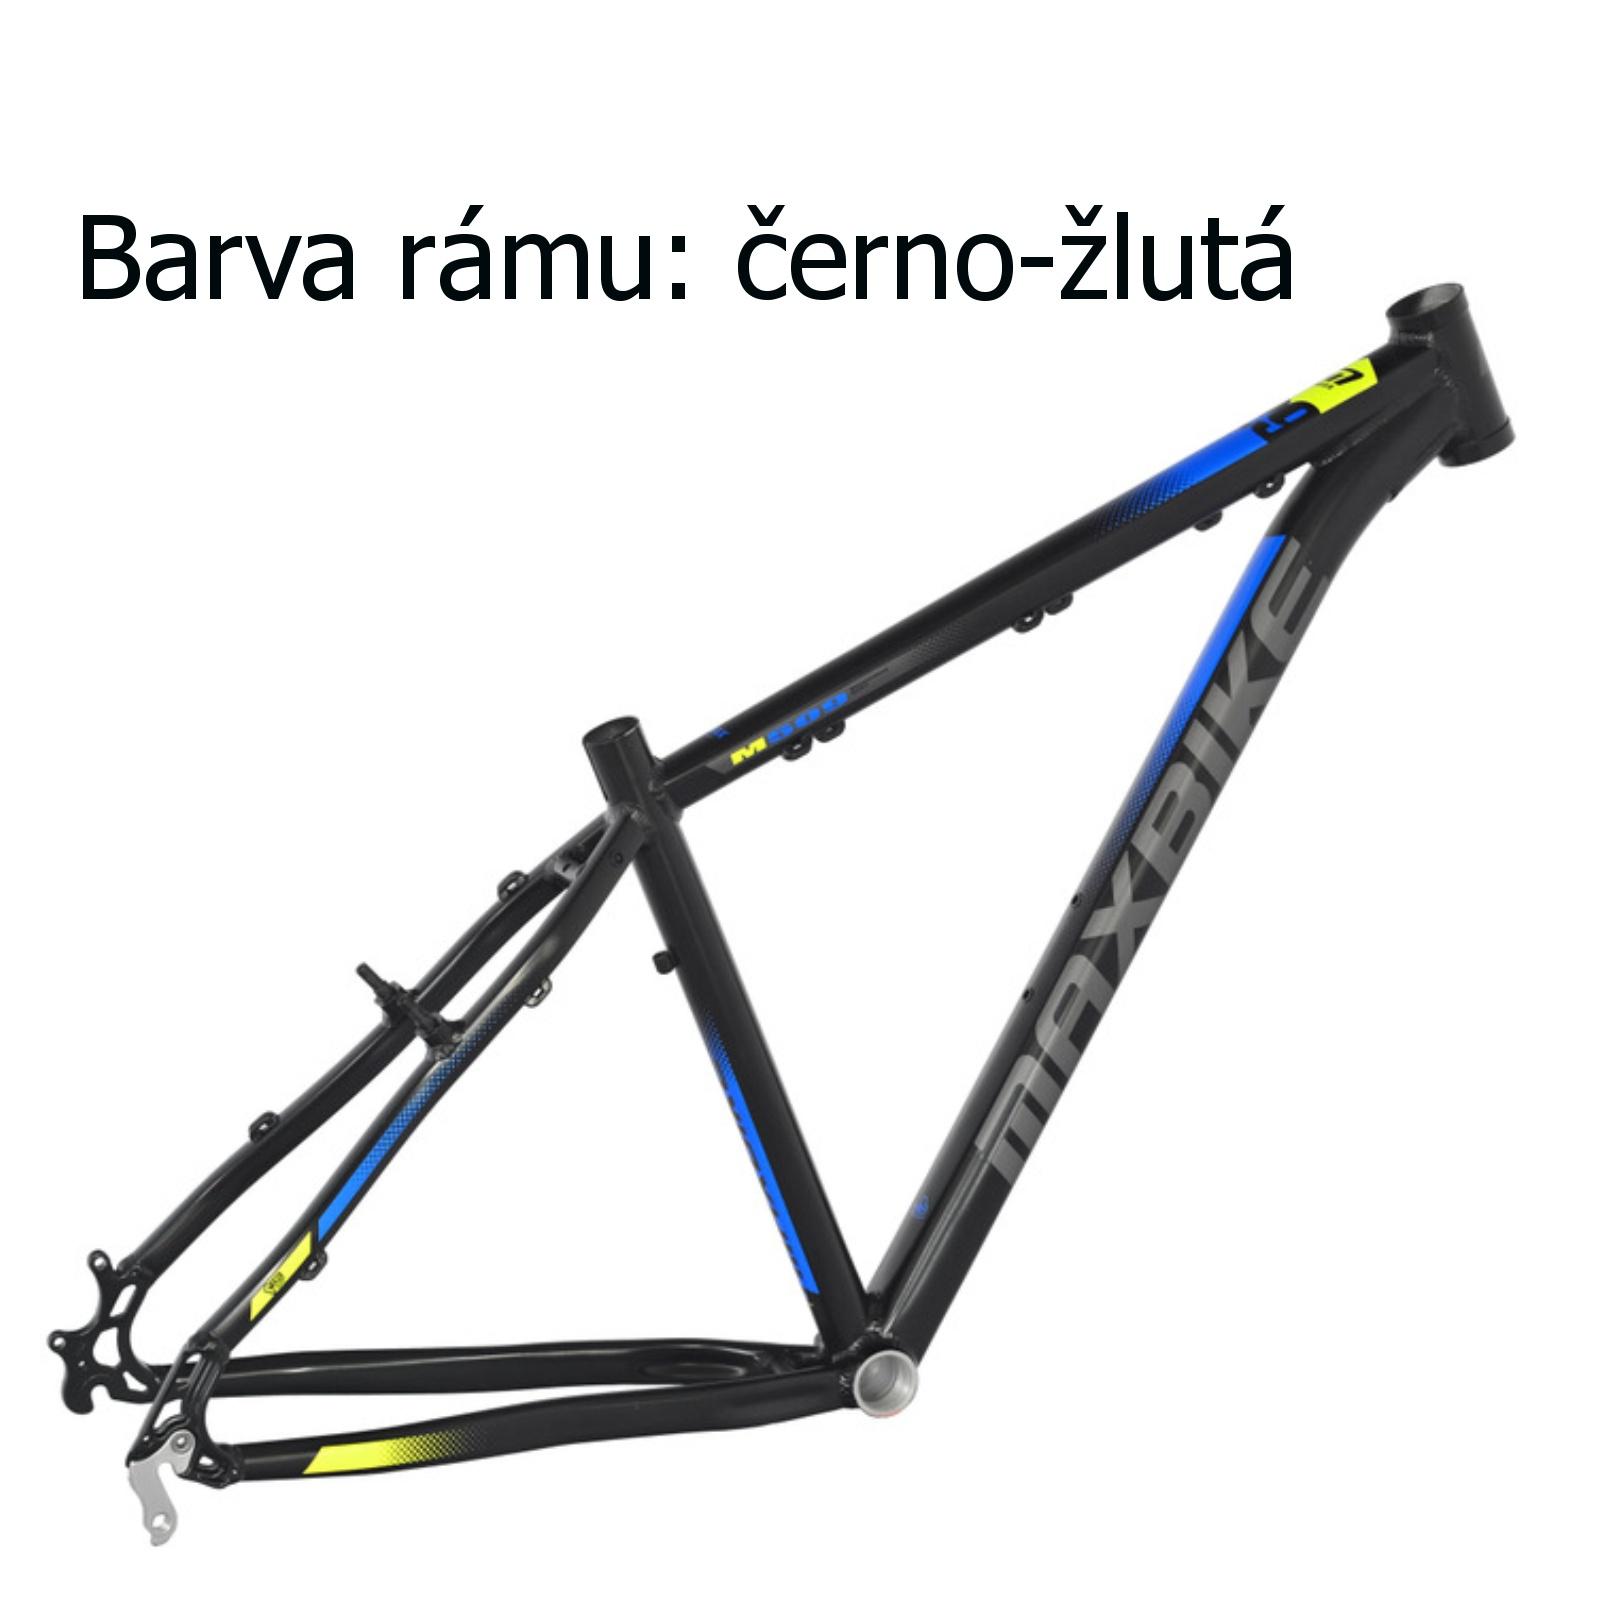 "Horské kolo MAXBIKE Apo 29 černo-žluté - vel. rámu 21"""